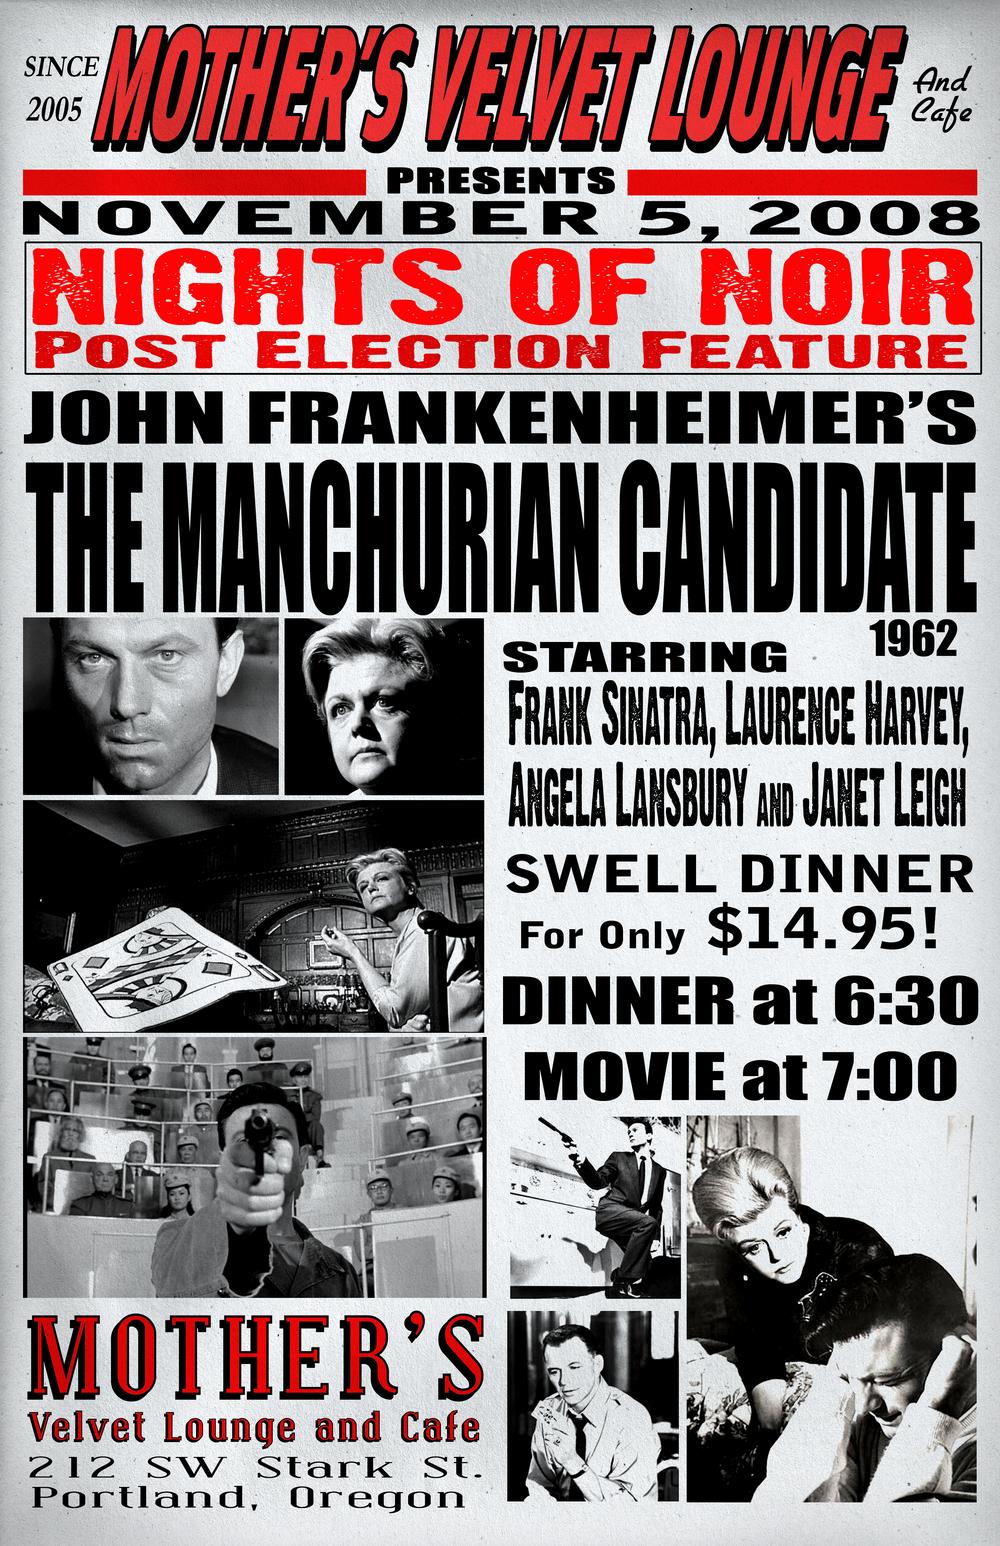 The Manchurian Candidate   (1962)  John Frankenheimer